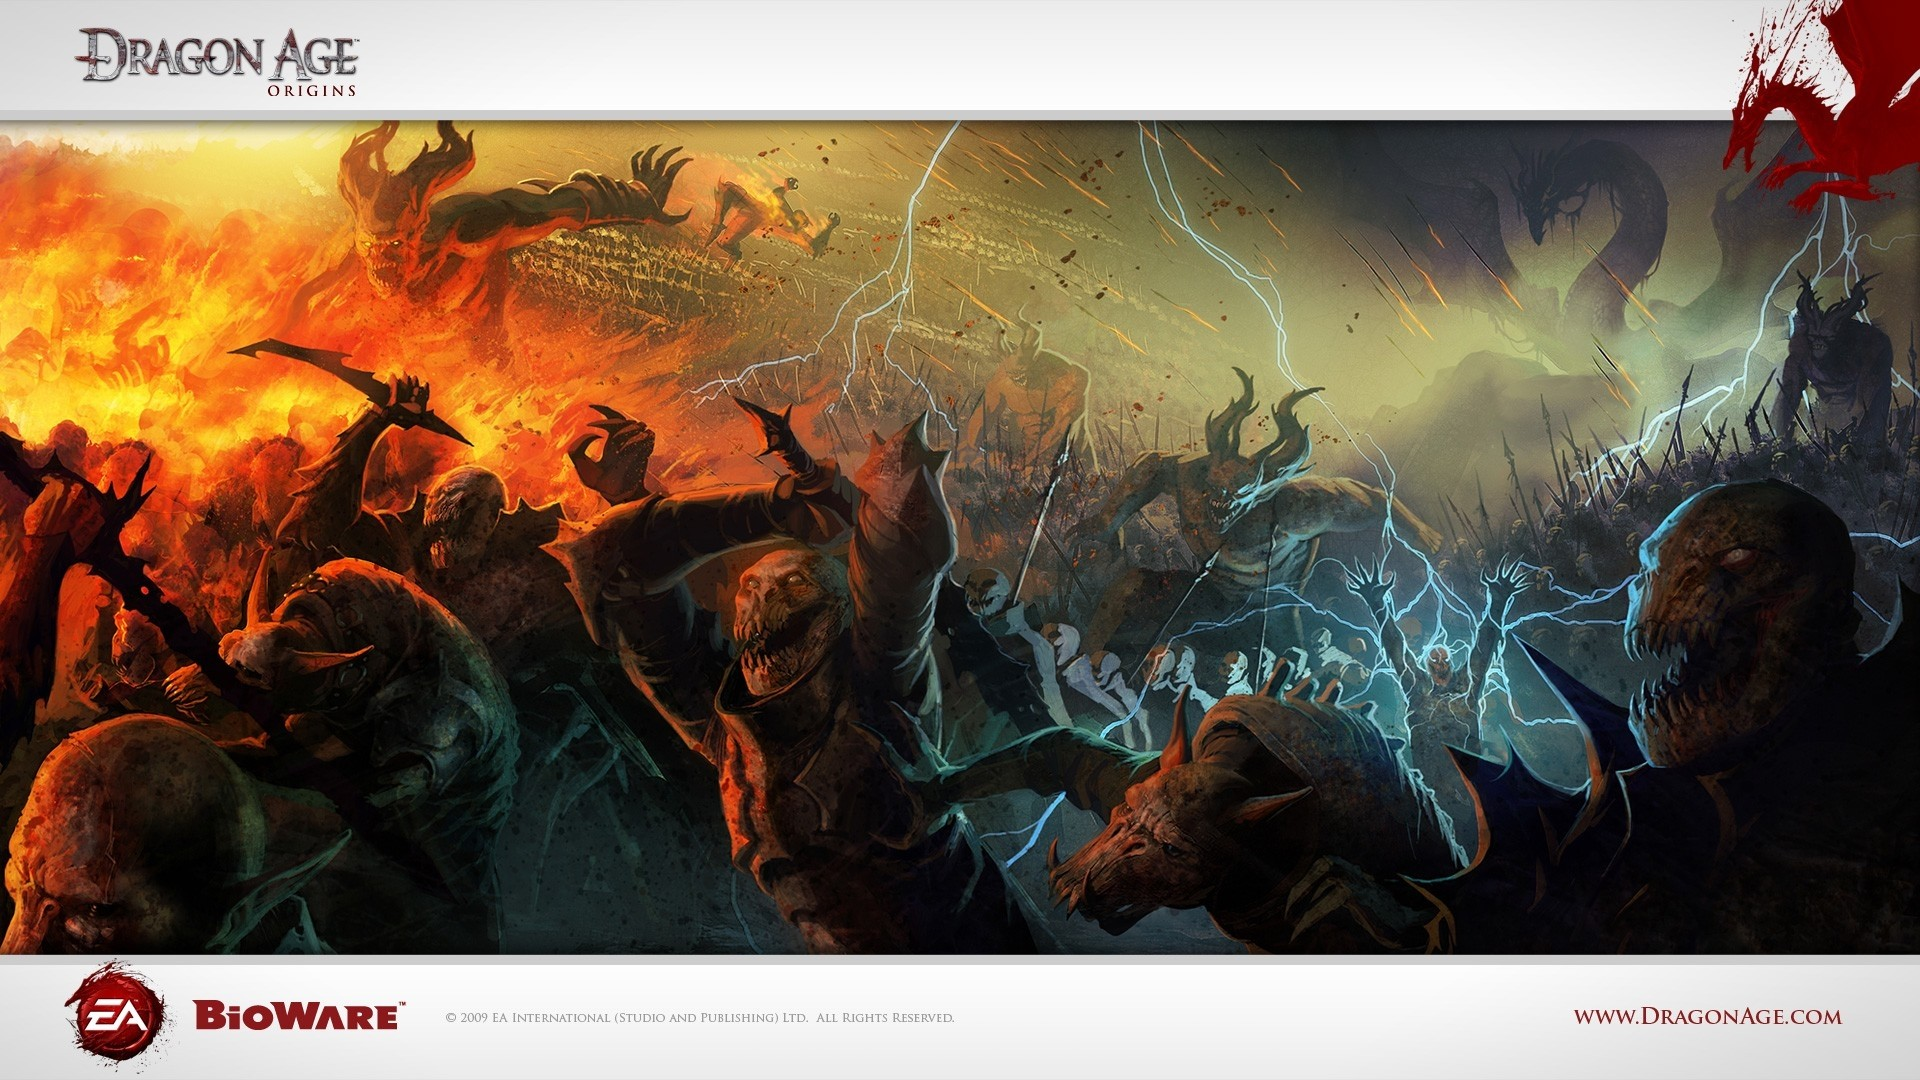 Wallpaper dragon age origins, monsters, zip, magic, fire